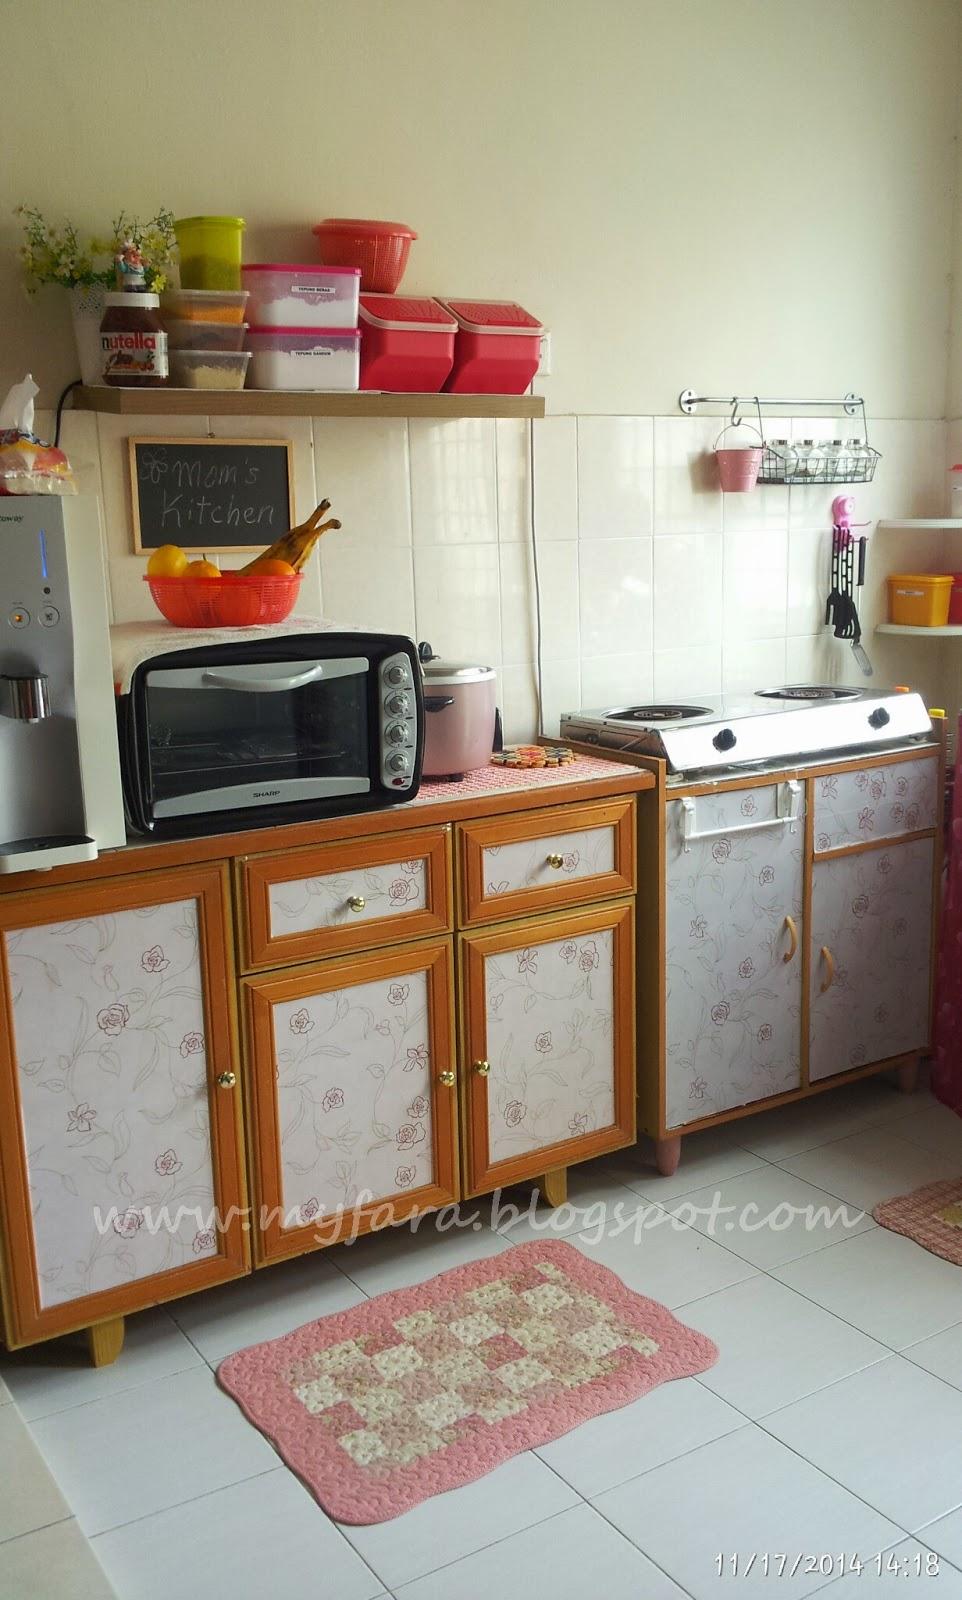 Inilah Dapur Masak Saya Biasa Sangat Rumah Sewa Ini Je Yang Termampu Ruang Pun Kecil Sebab Ni Memanjang Bersekali Dengan Makan Dan Laundry